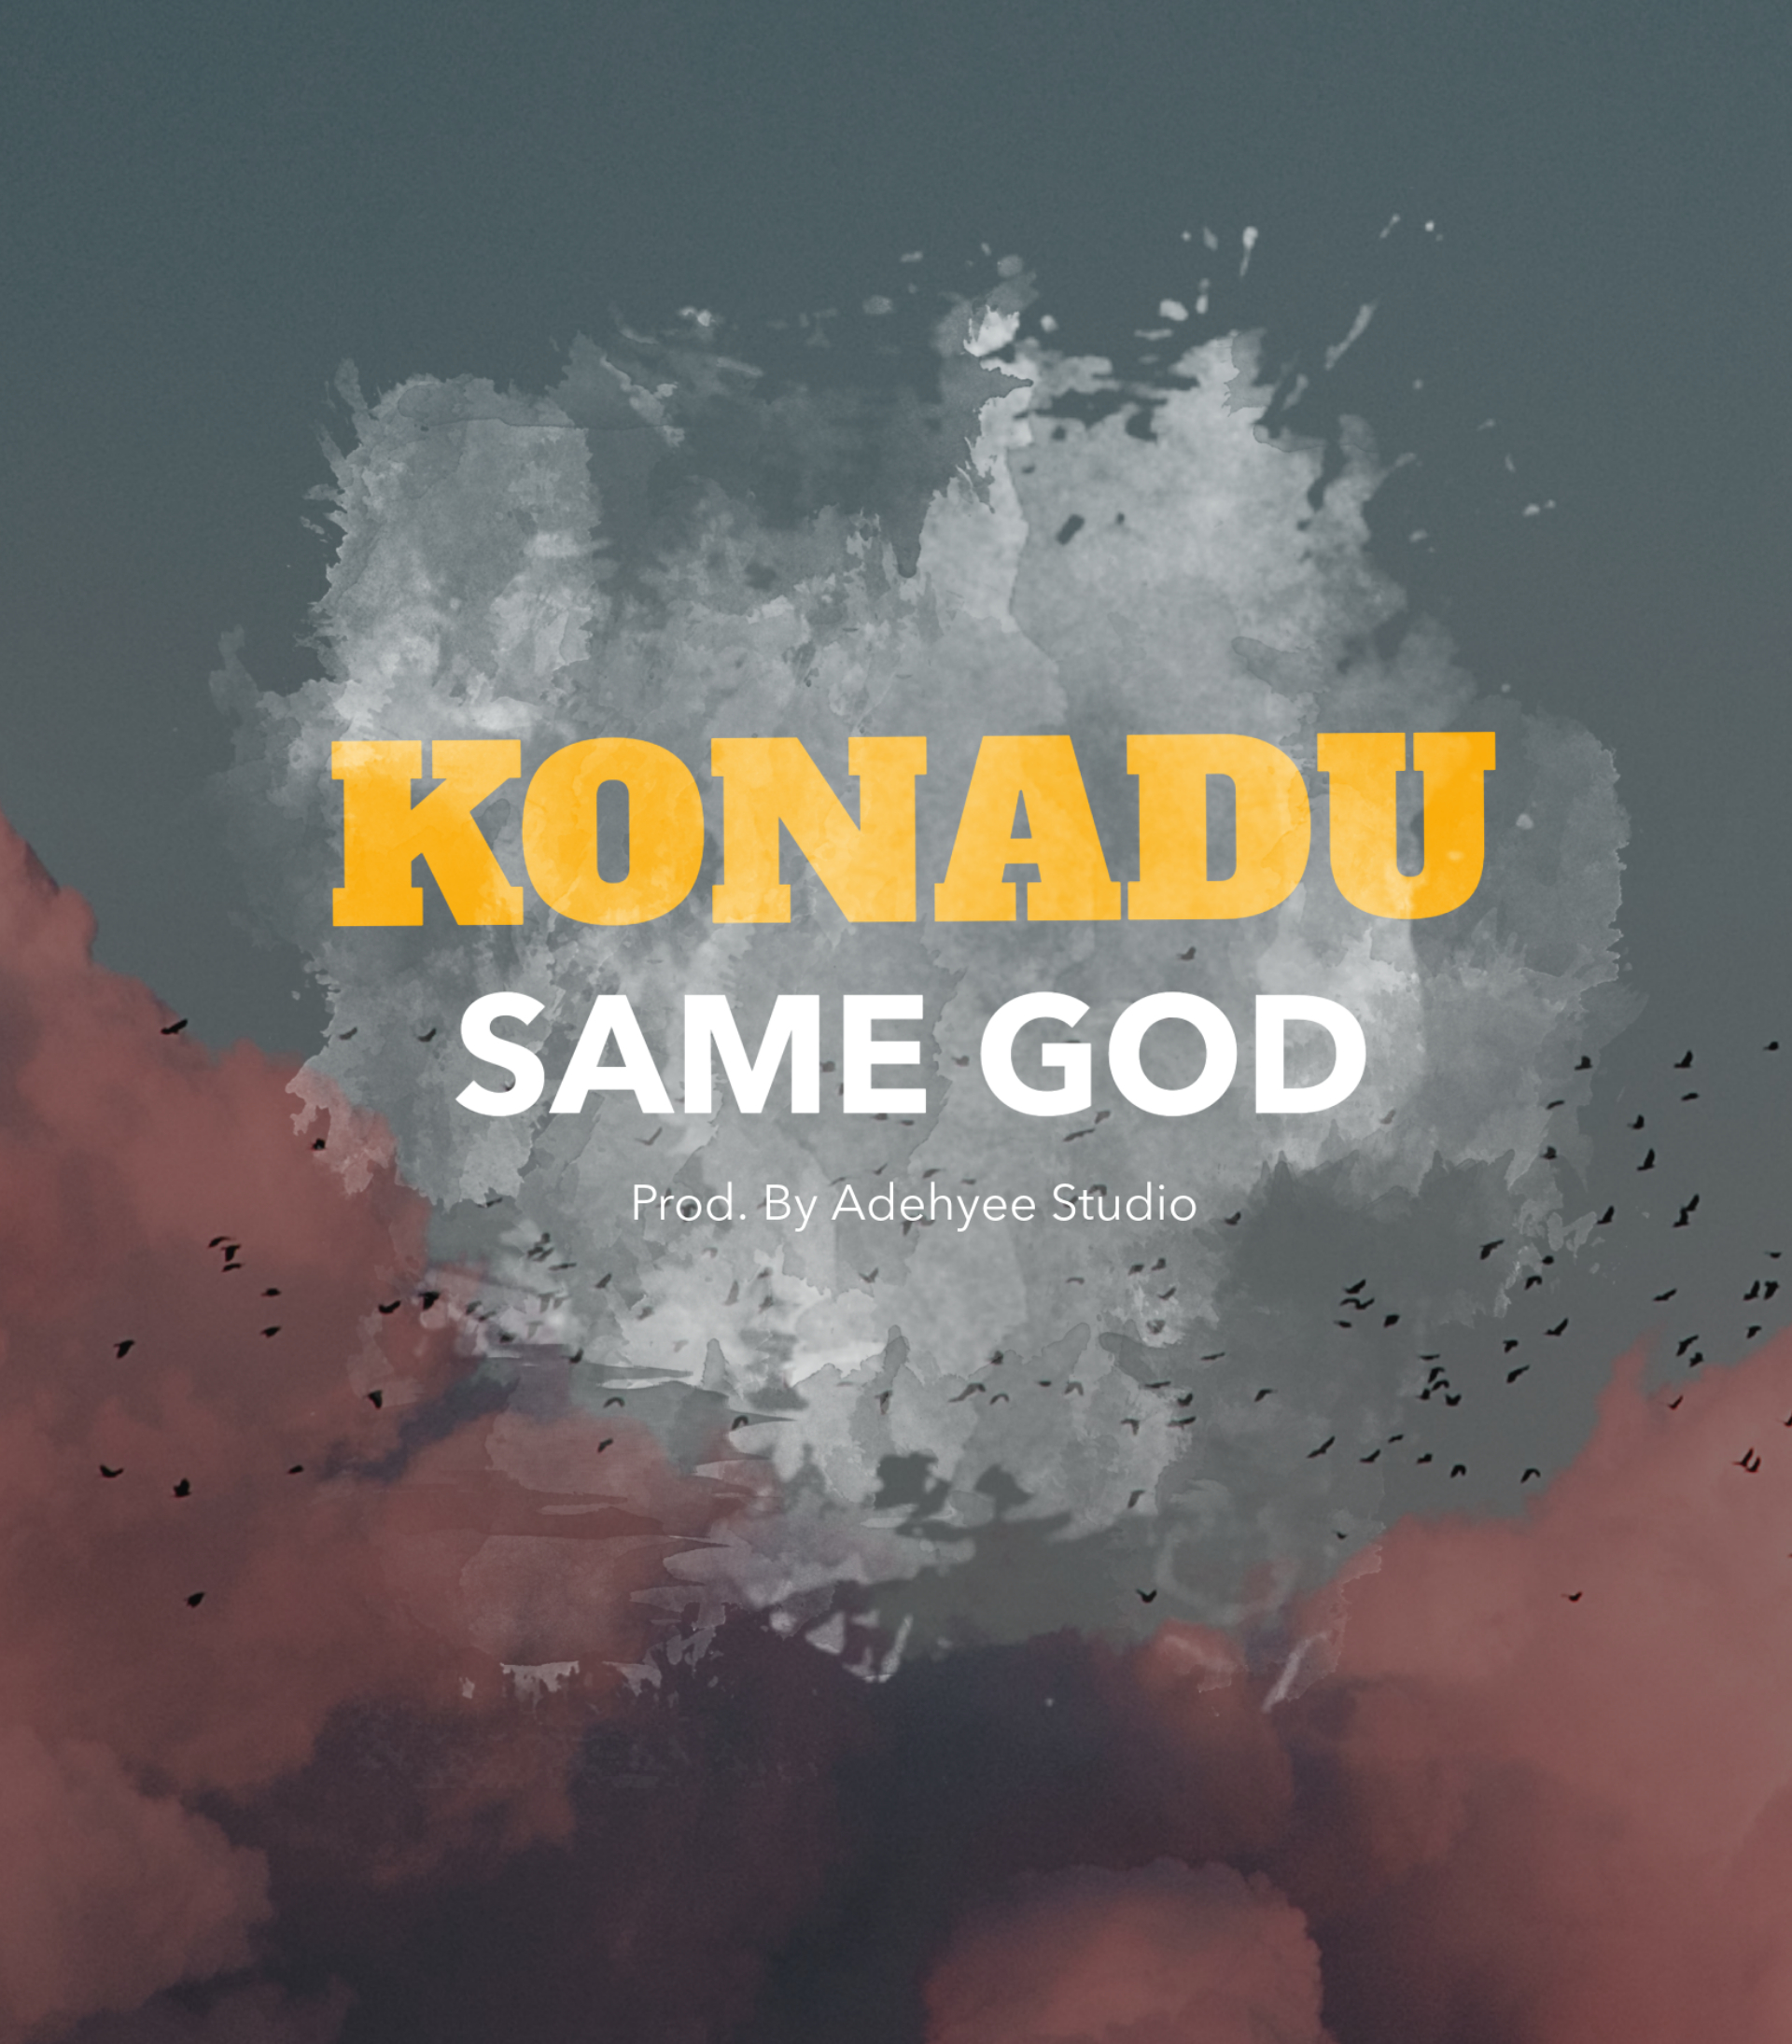 Listen Up: Konadu Gospel Drops New Single '' Same God''